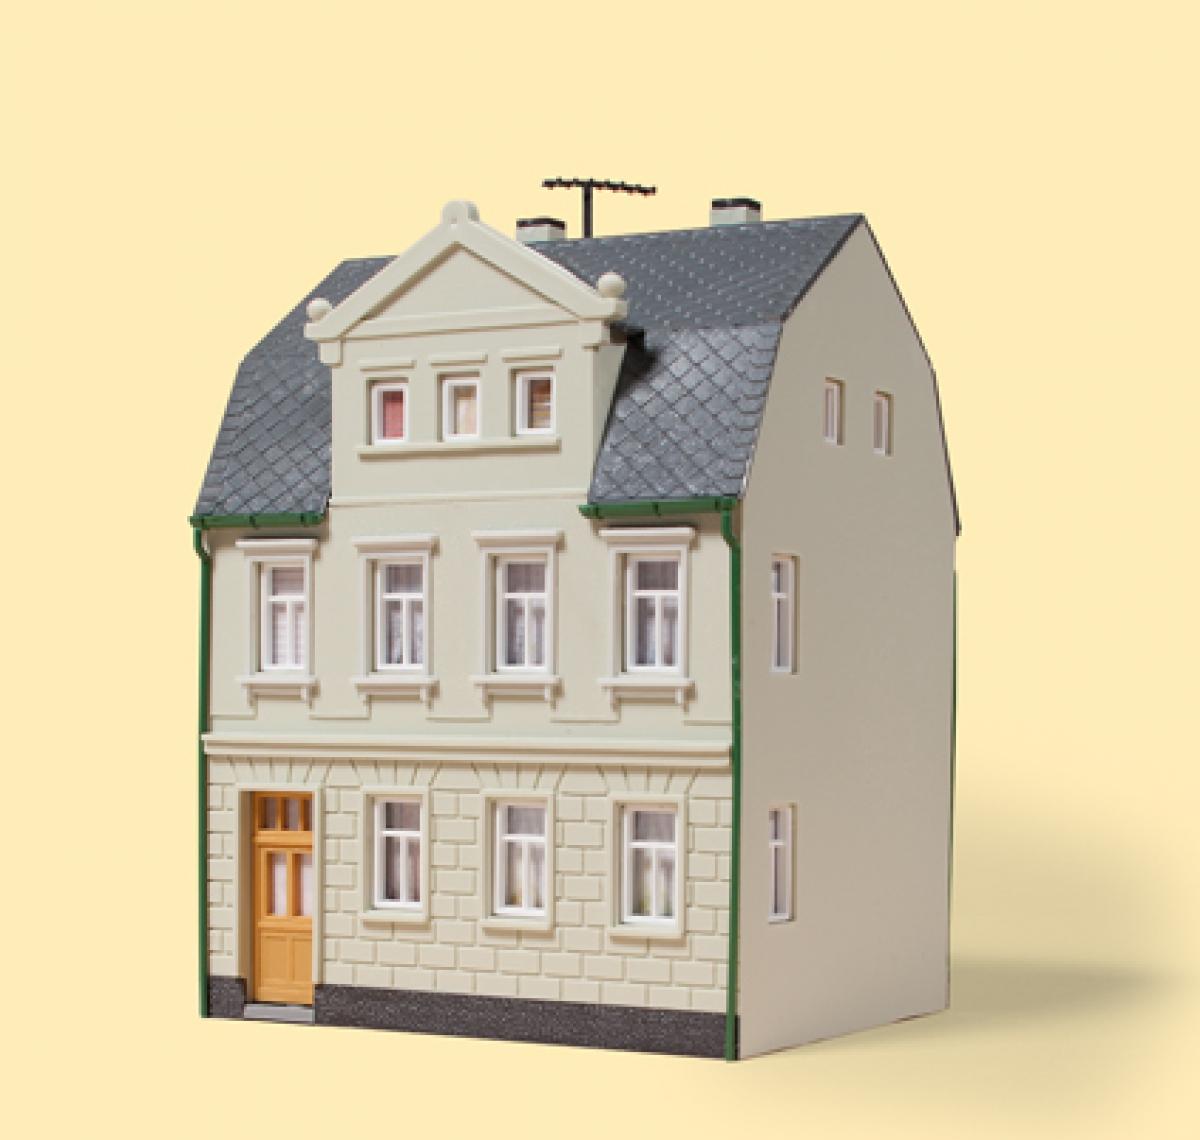 Auhagen Bausatz Wohnhaus Nr. 1 - TT/ H0 (1:100)